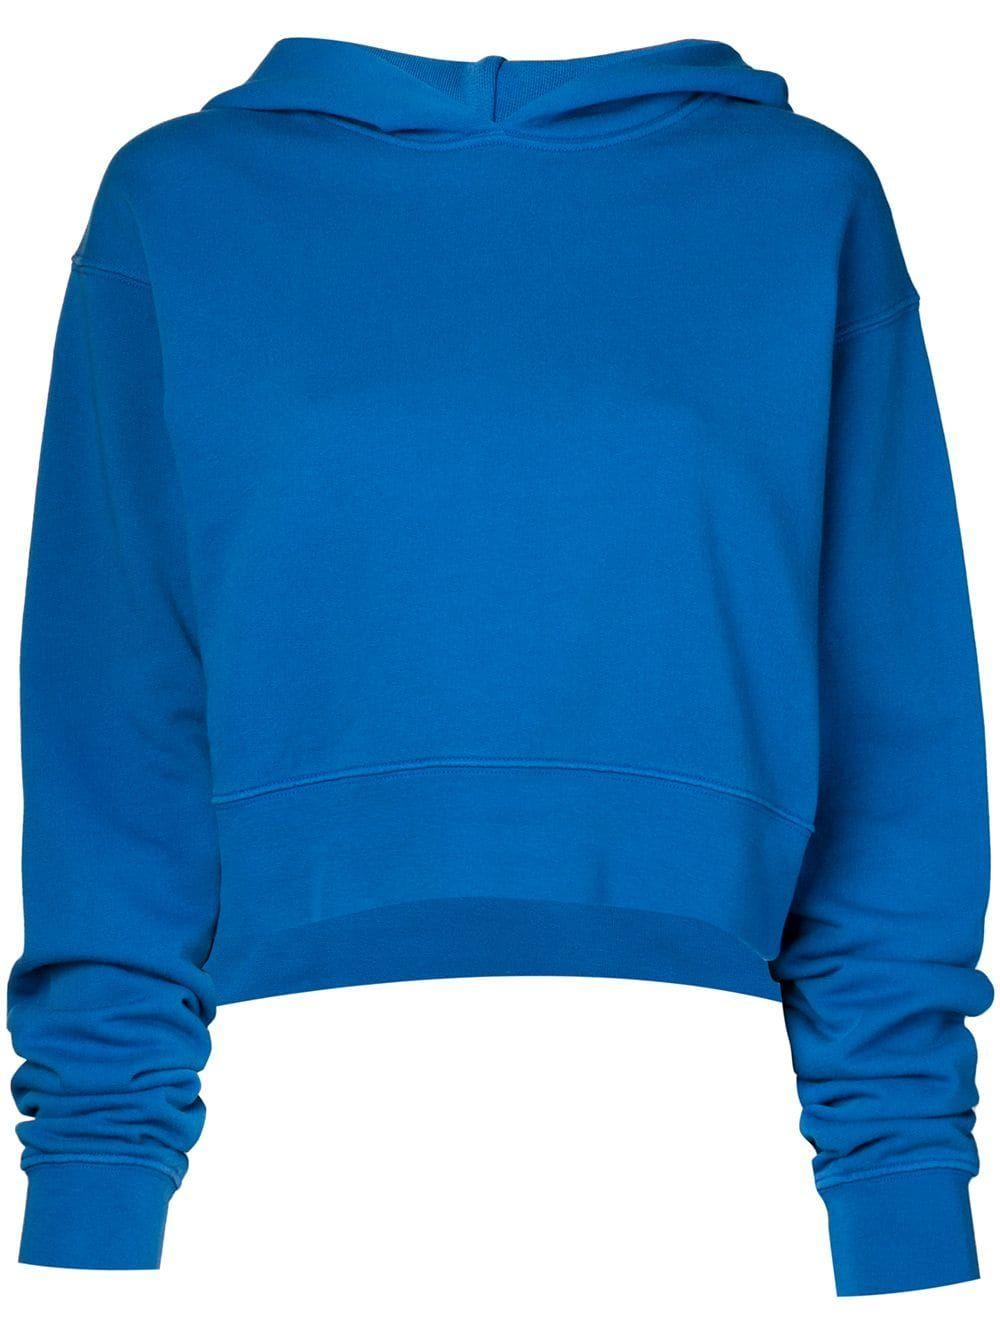 WT002A BLUE 24 6671